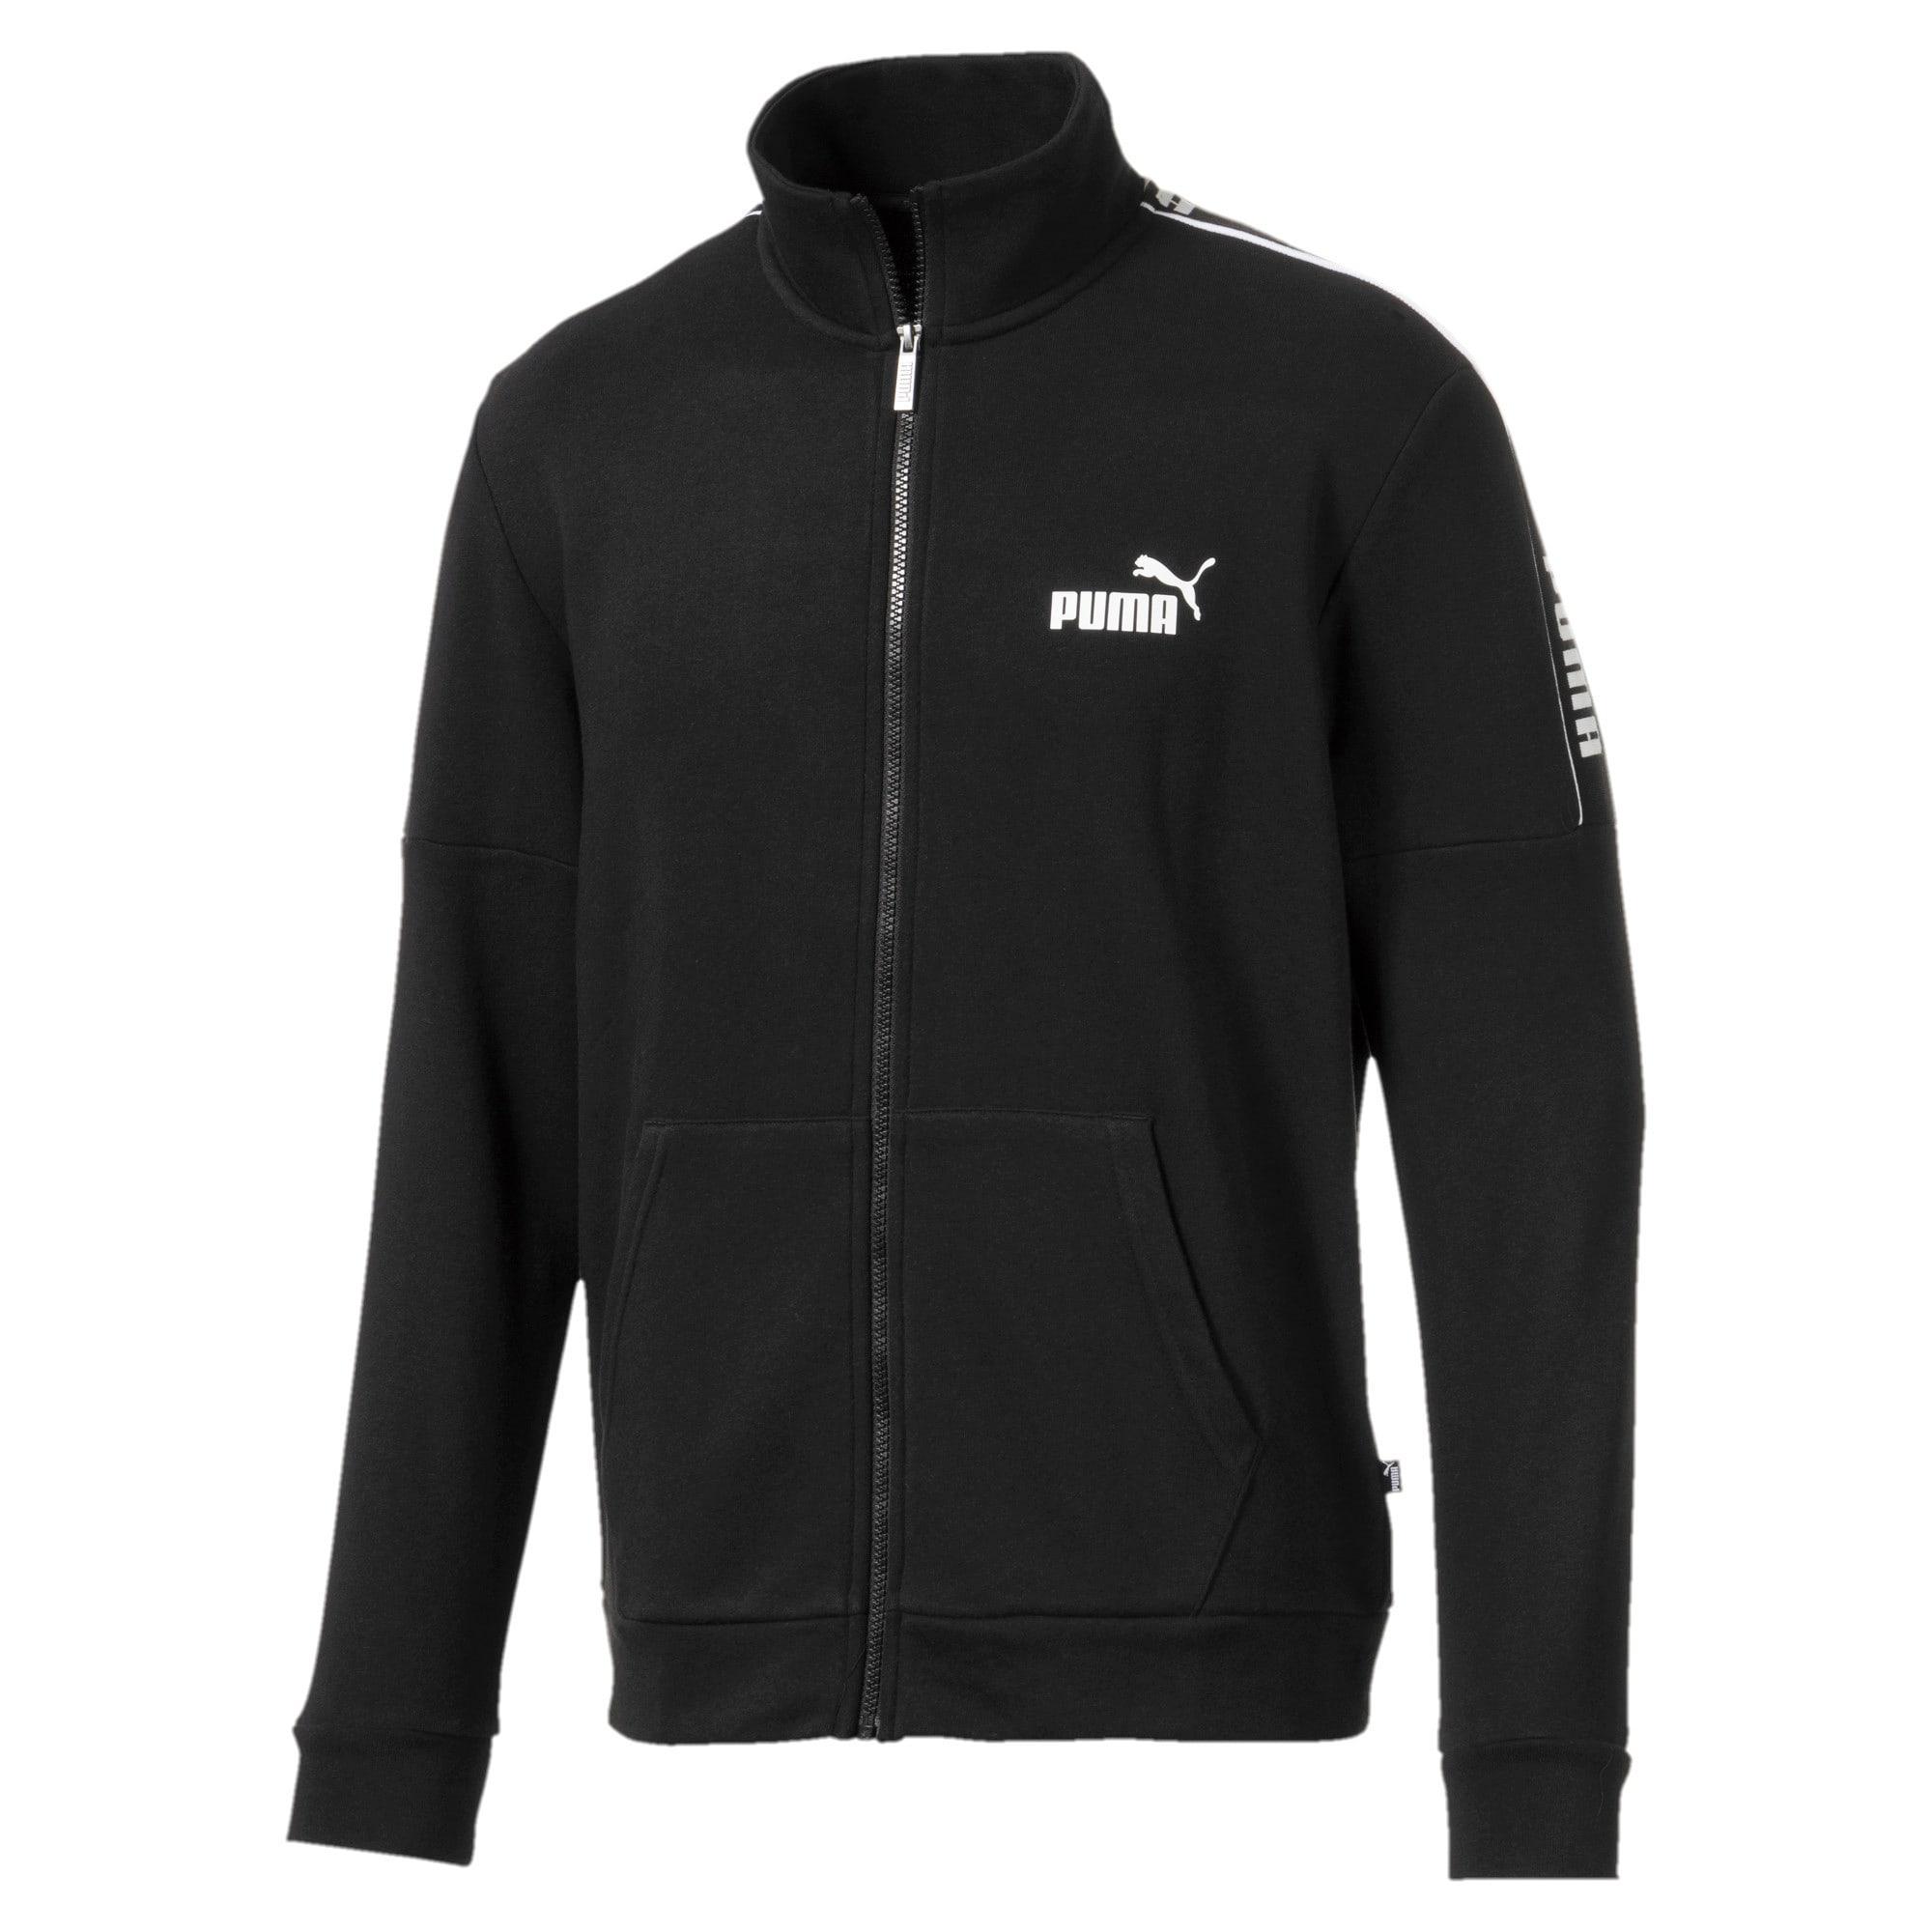 Thumbnail 1 of Amplified Men's Track Jacket, Puma Black, medium